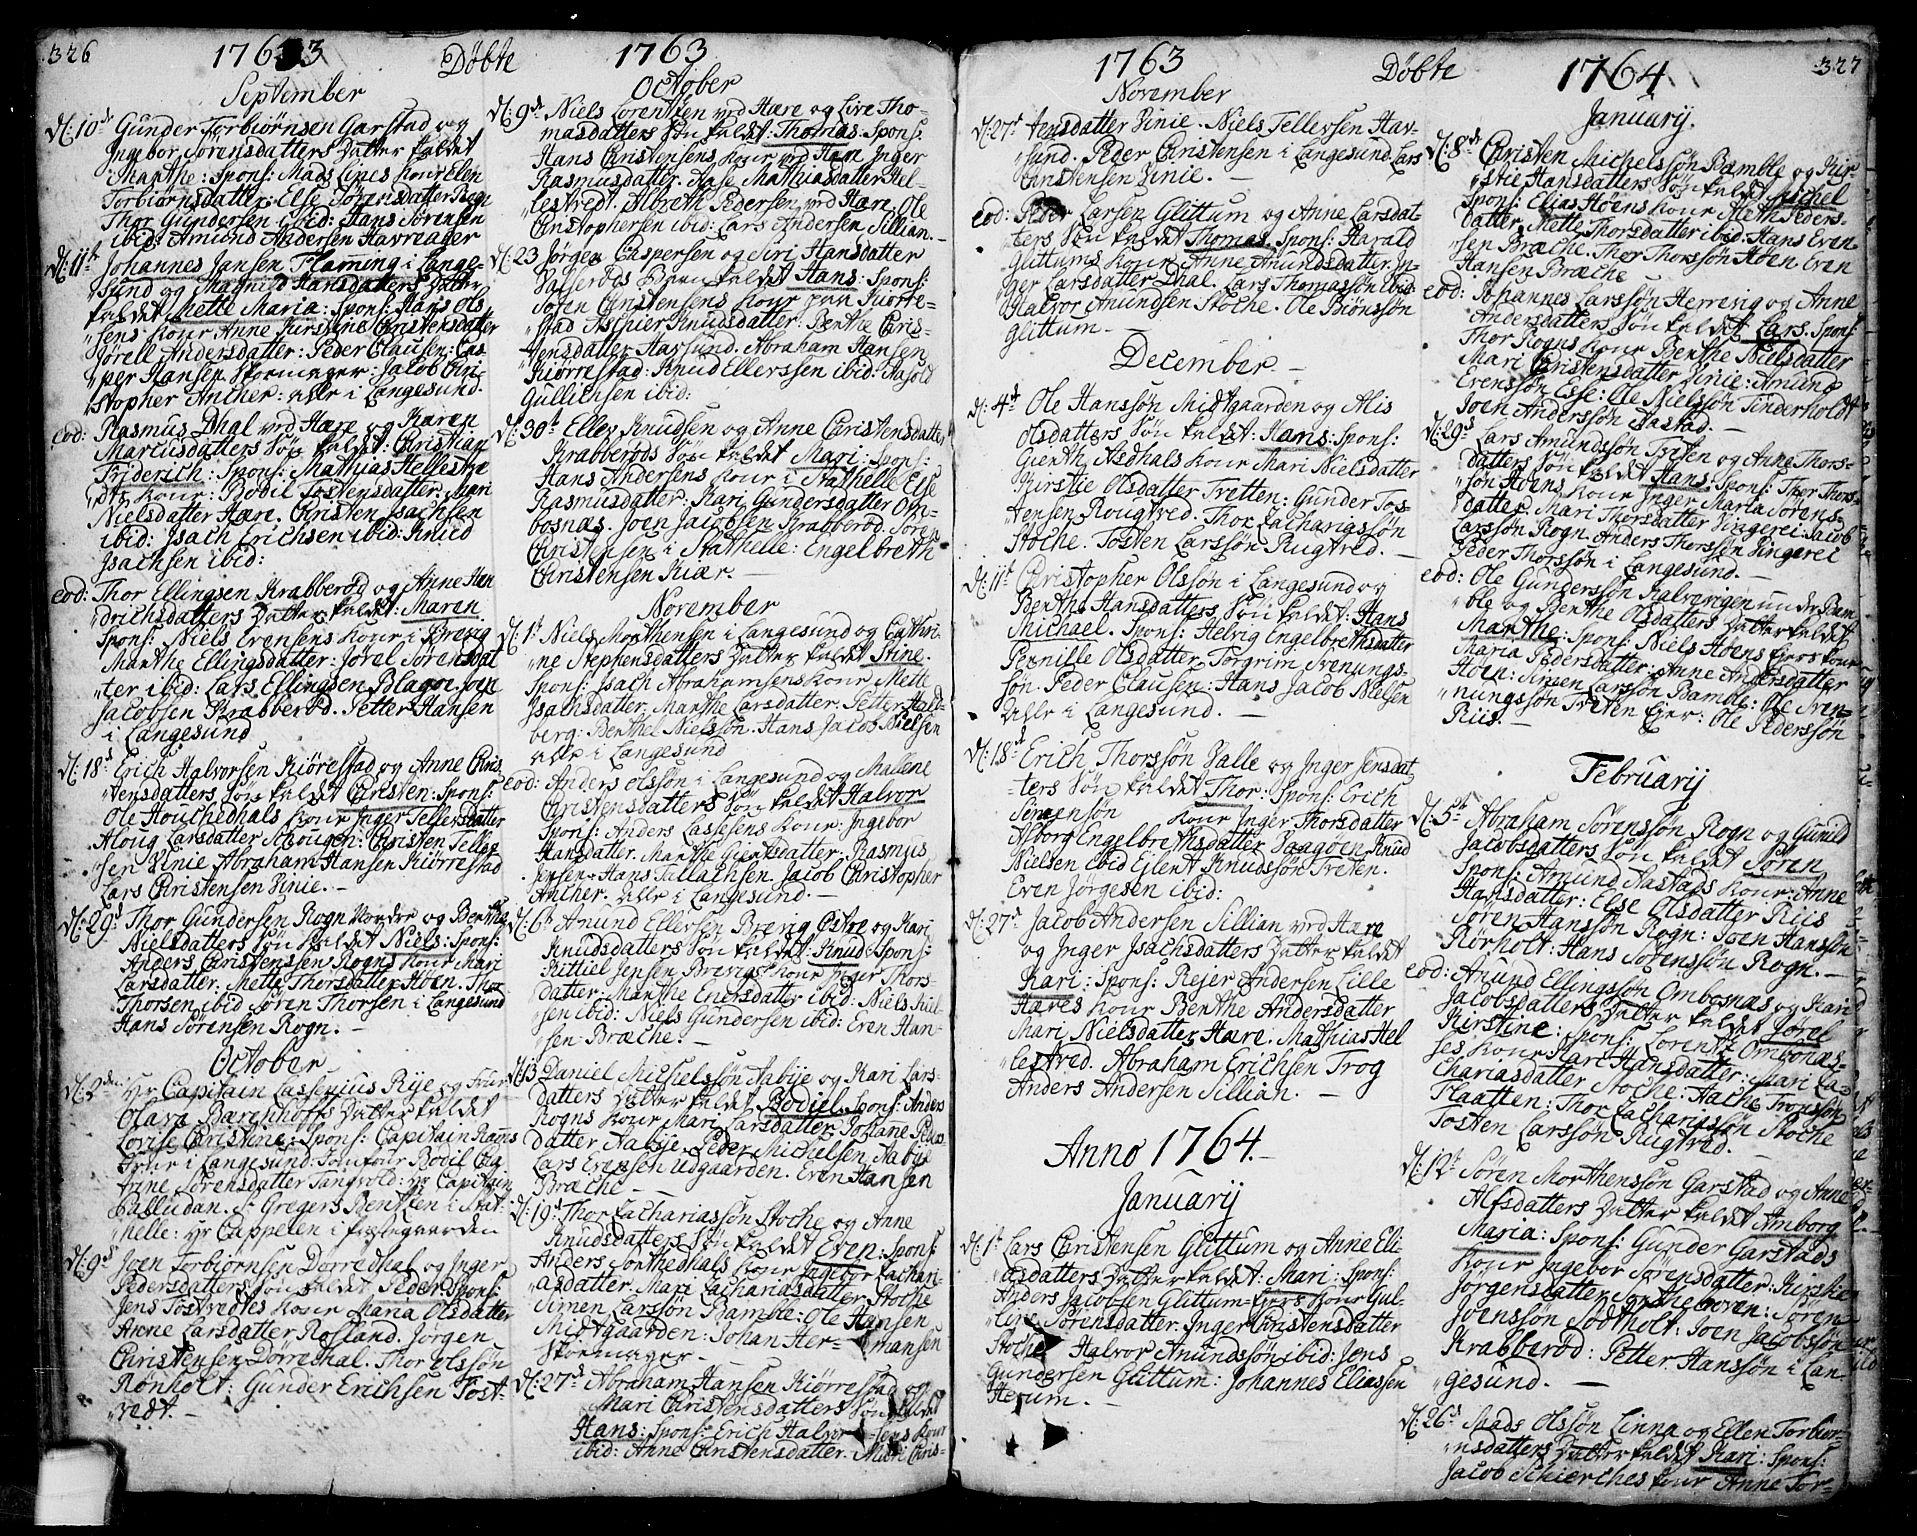 SAKO, Bamble kirkebøker, F/Fa/L0001: Ministerialbok nr. I 1, 1702-1774, s. 326-327